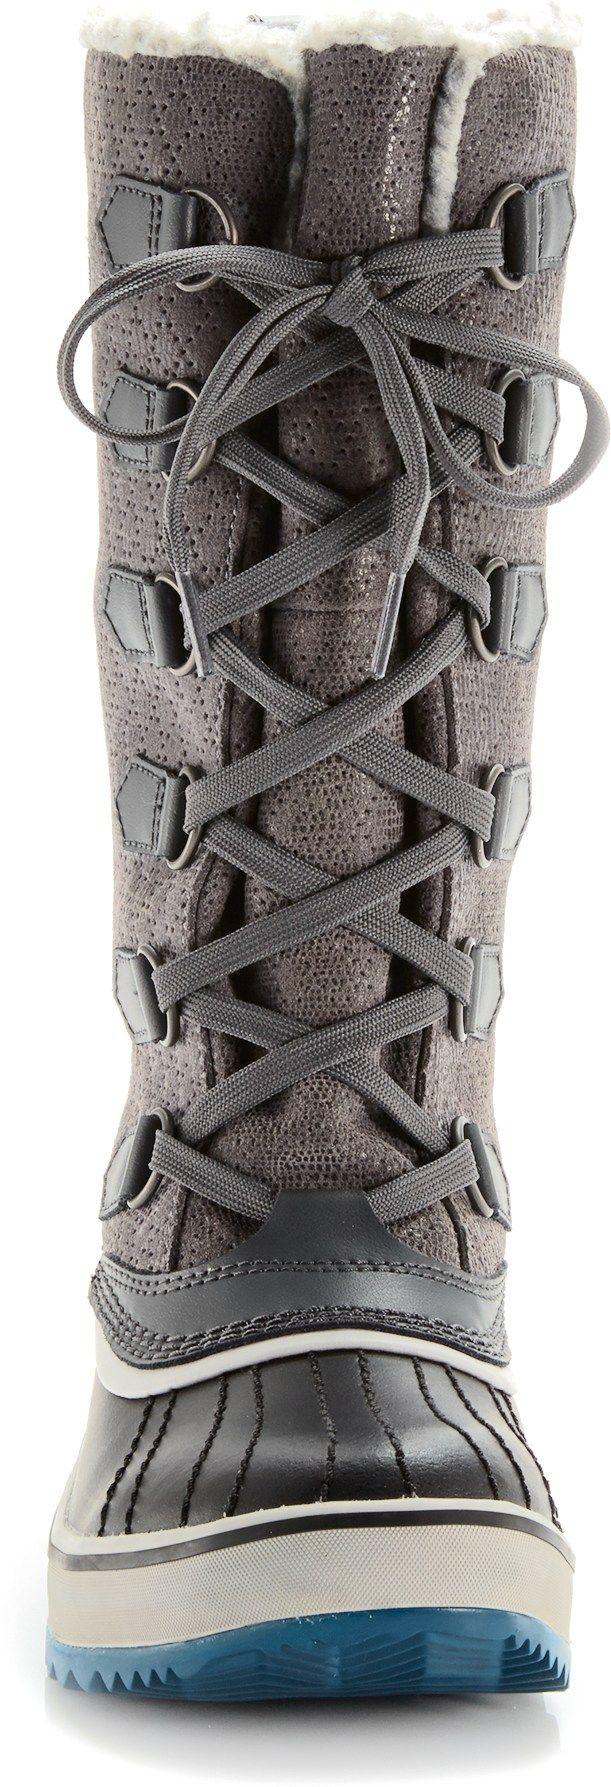 Sorel Tivoli High Snow Boots - Women's size 9.5, shale/oyster $140.00